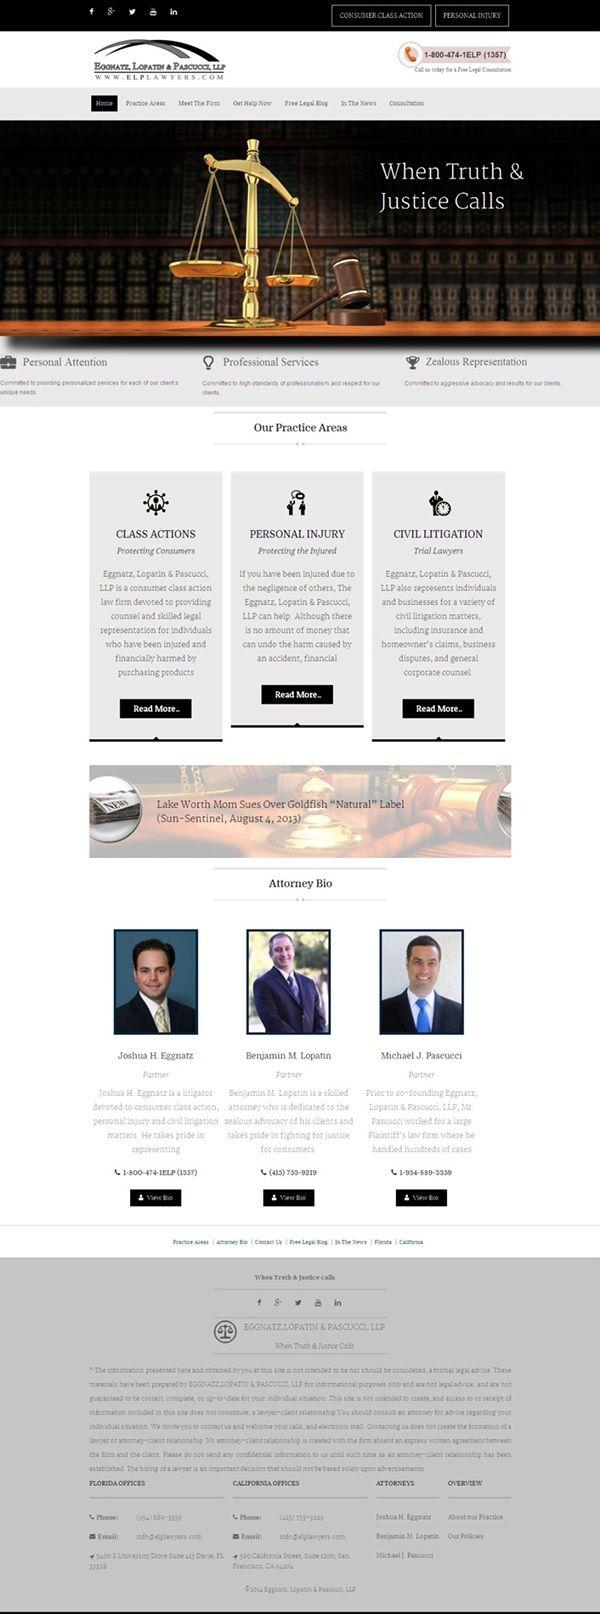 law firm website design – ELP Lawyers on Behance